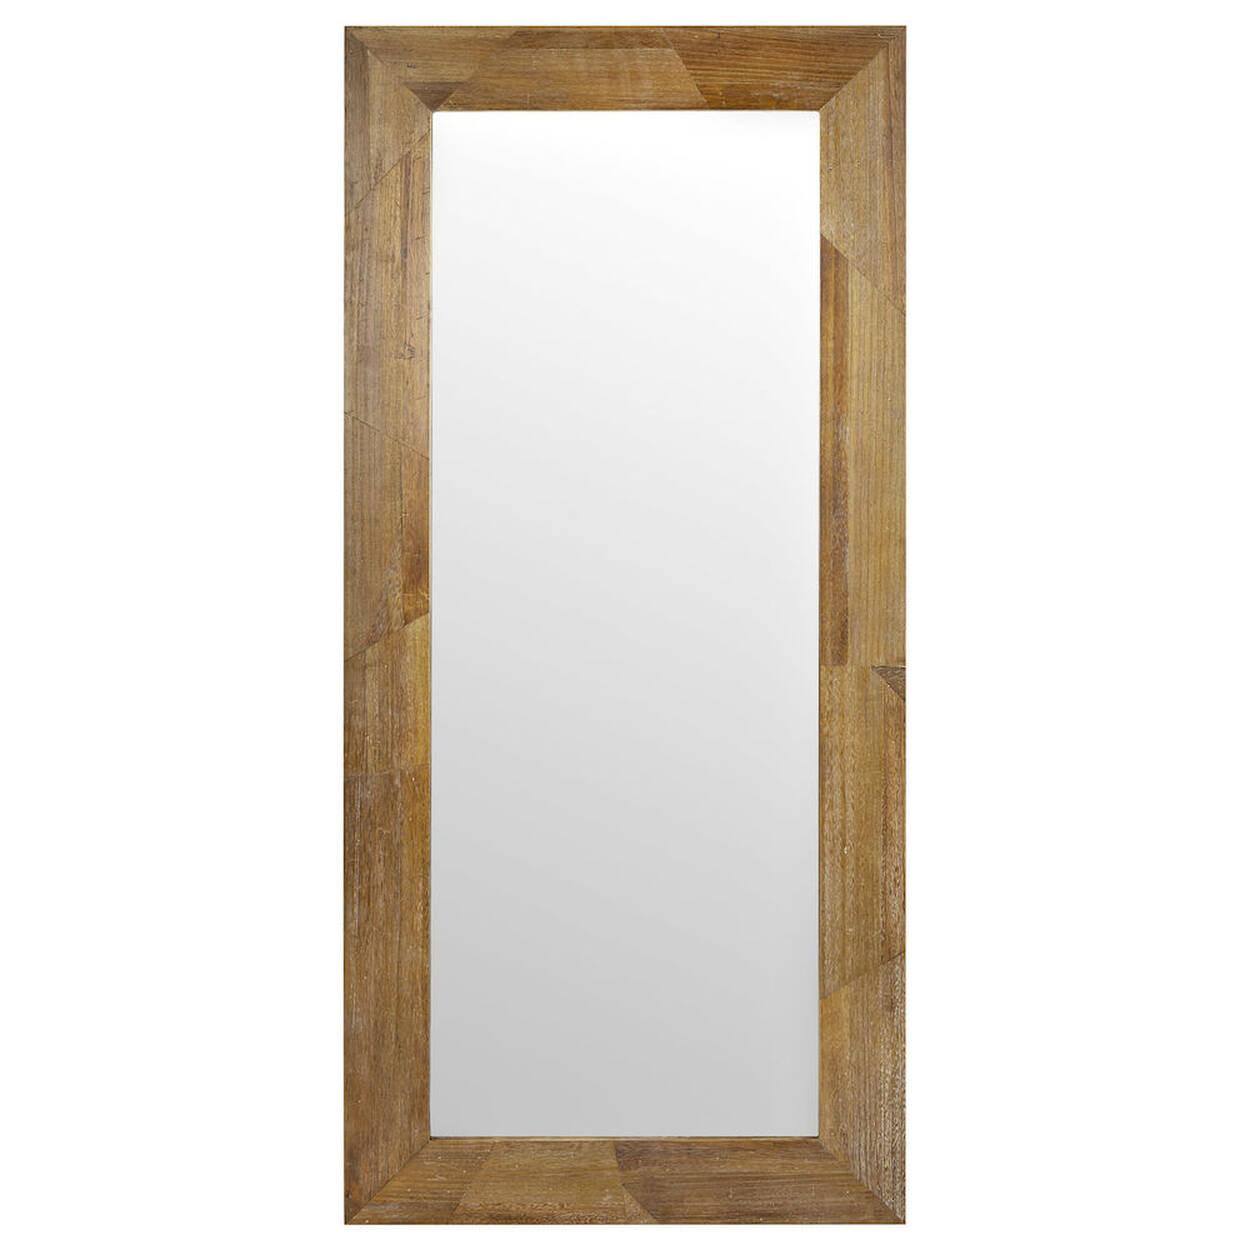 miroir avec cadre en bois. Black Bedroom Furniture Sets. Home Design Ideas